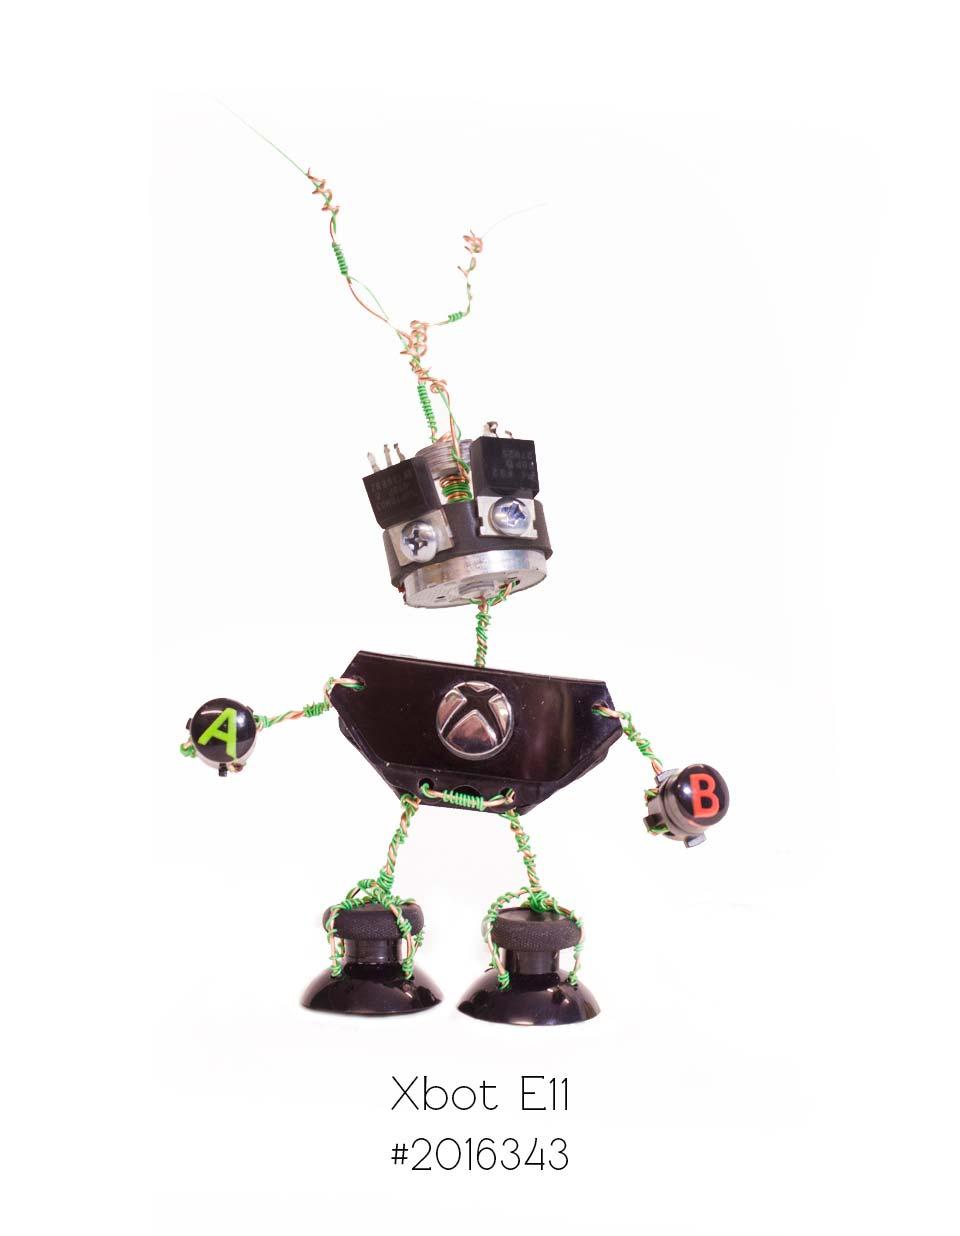 bots-22